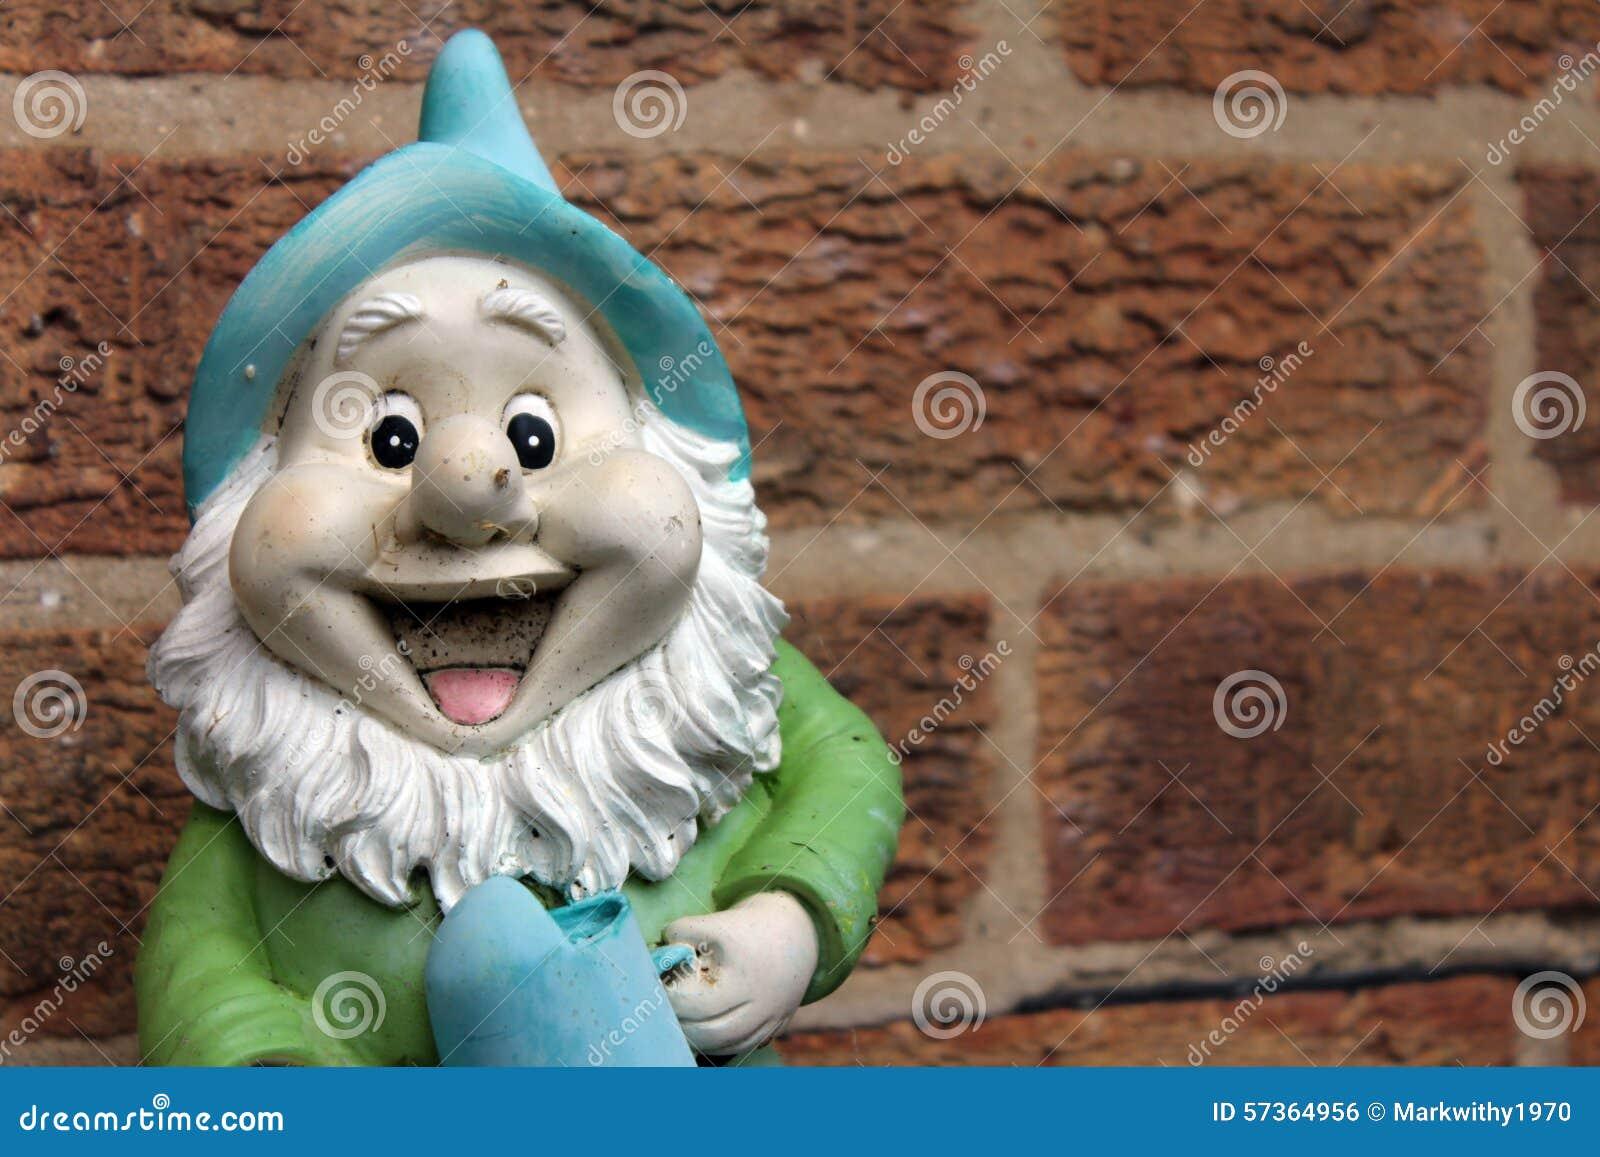 Happy gnome stock photo. Image of happy, smiling, smile - 57364956